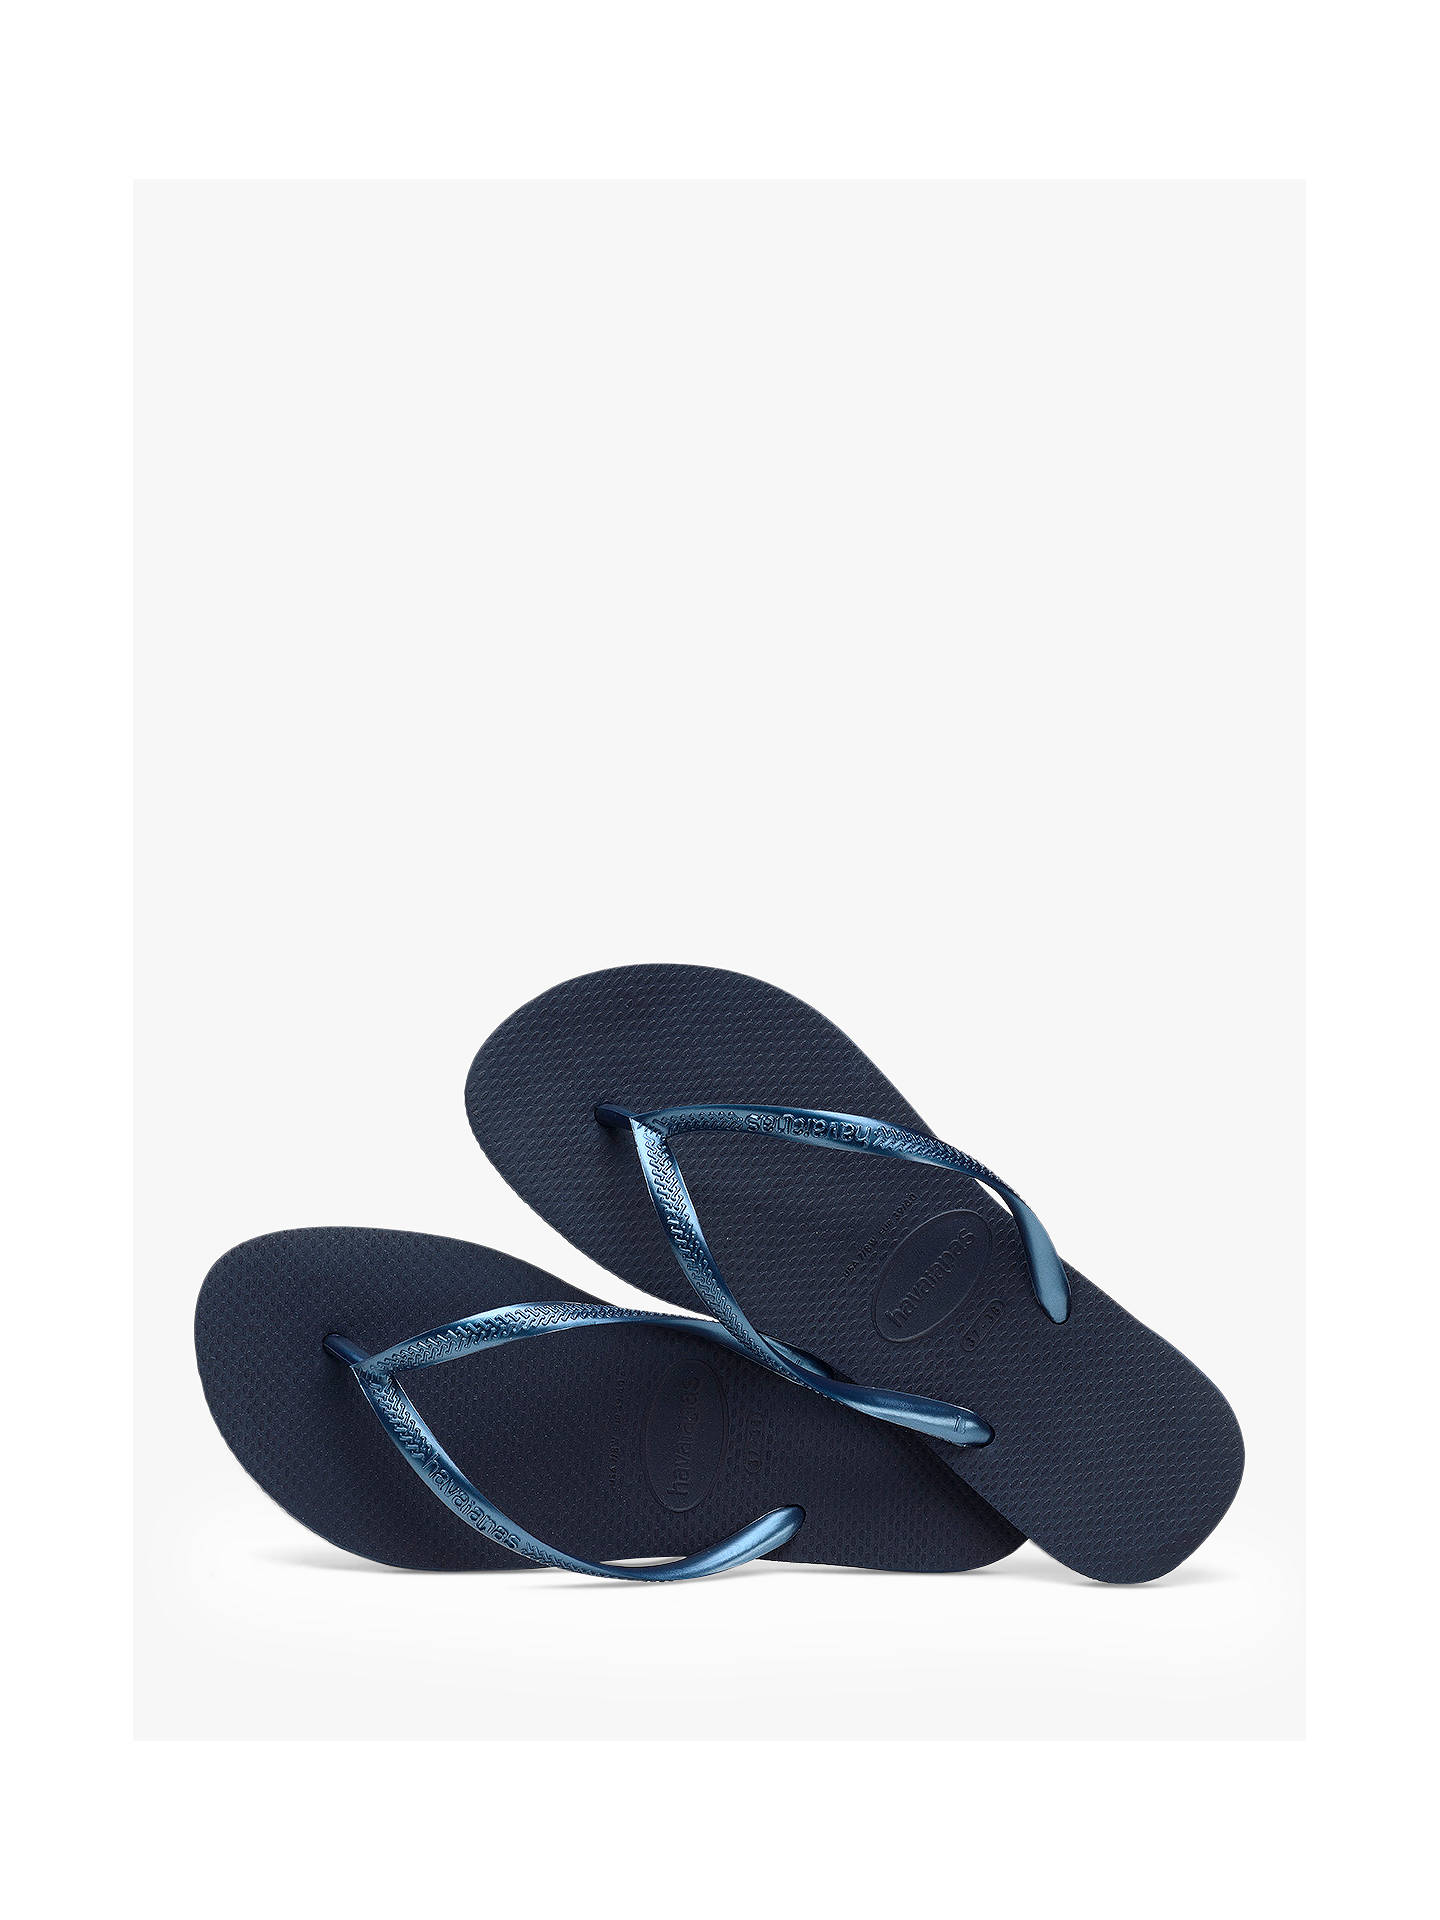 3622a90d2c33 Havaianas Slim Flip Flops at John Lewis   Partners